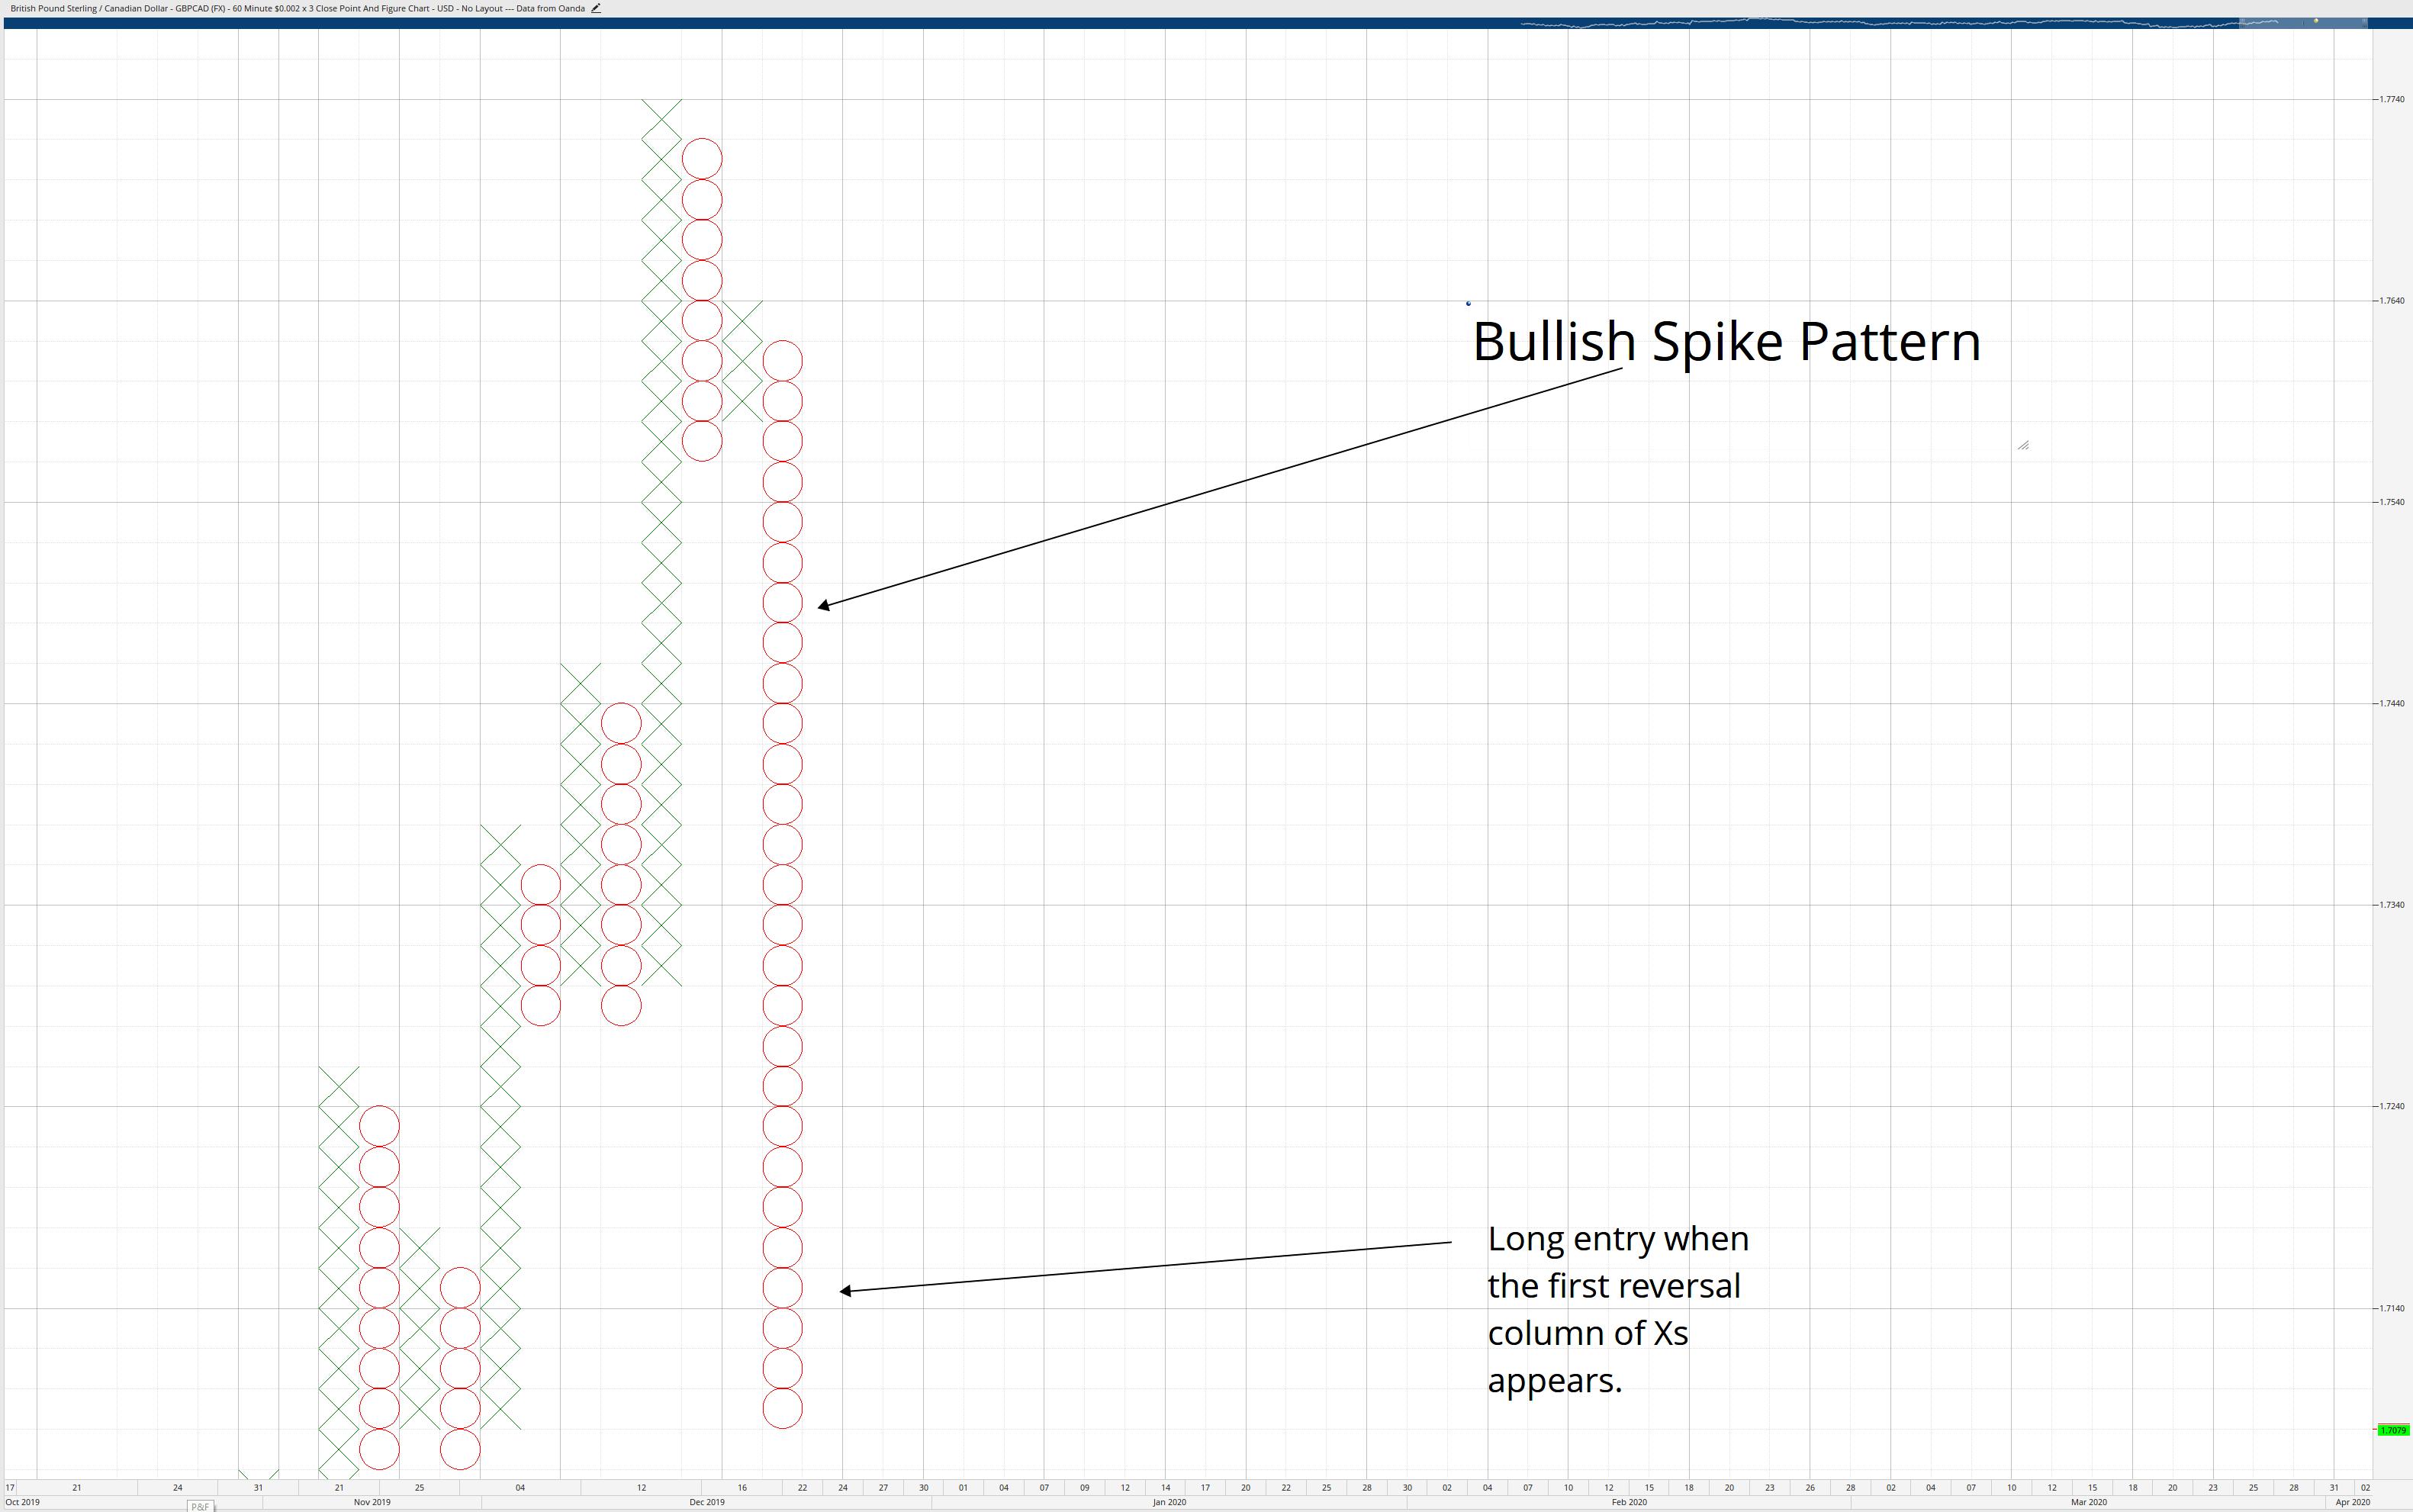 Bullish Spike Pattern